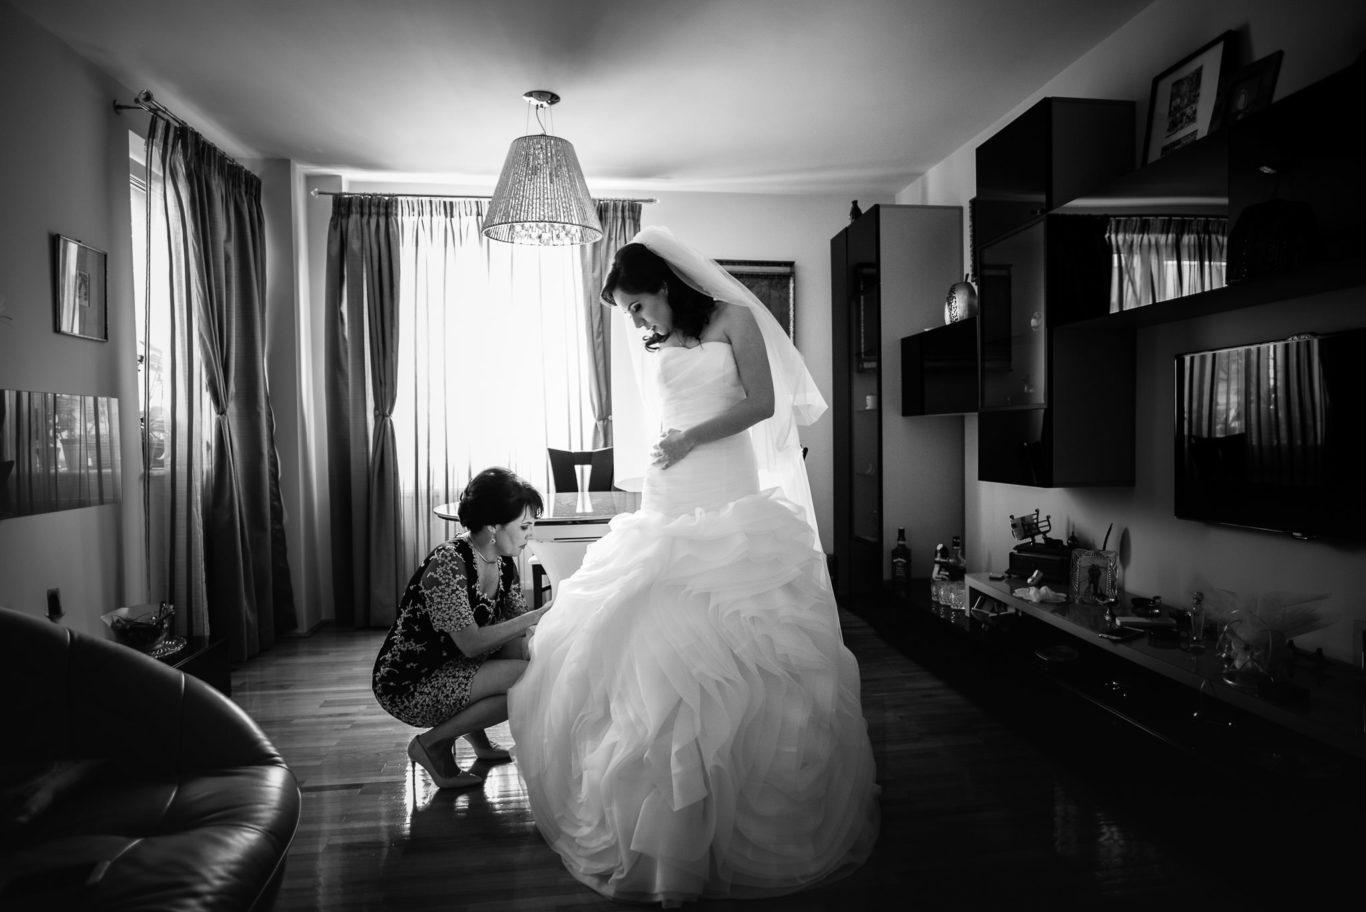 0207-Fotografie-nunta-Simona-Valentin-fotograf-Ciprian-Dumitrescu-DSC_1006